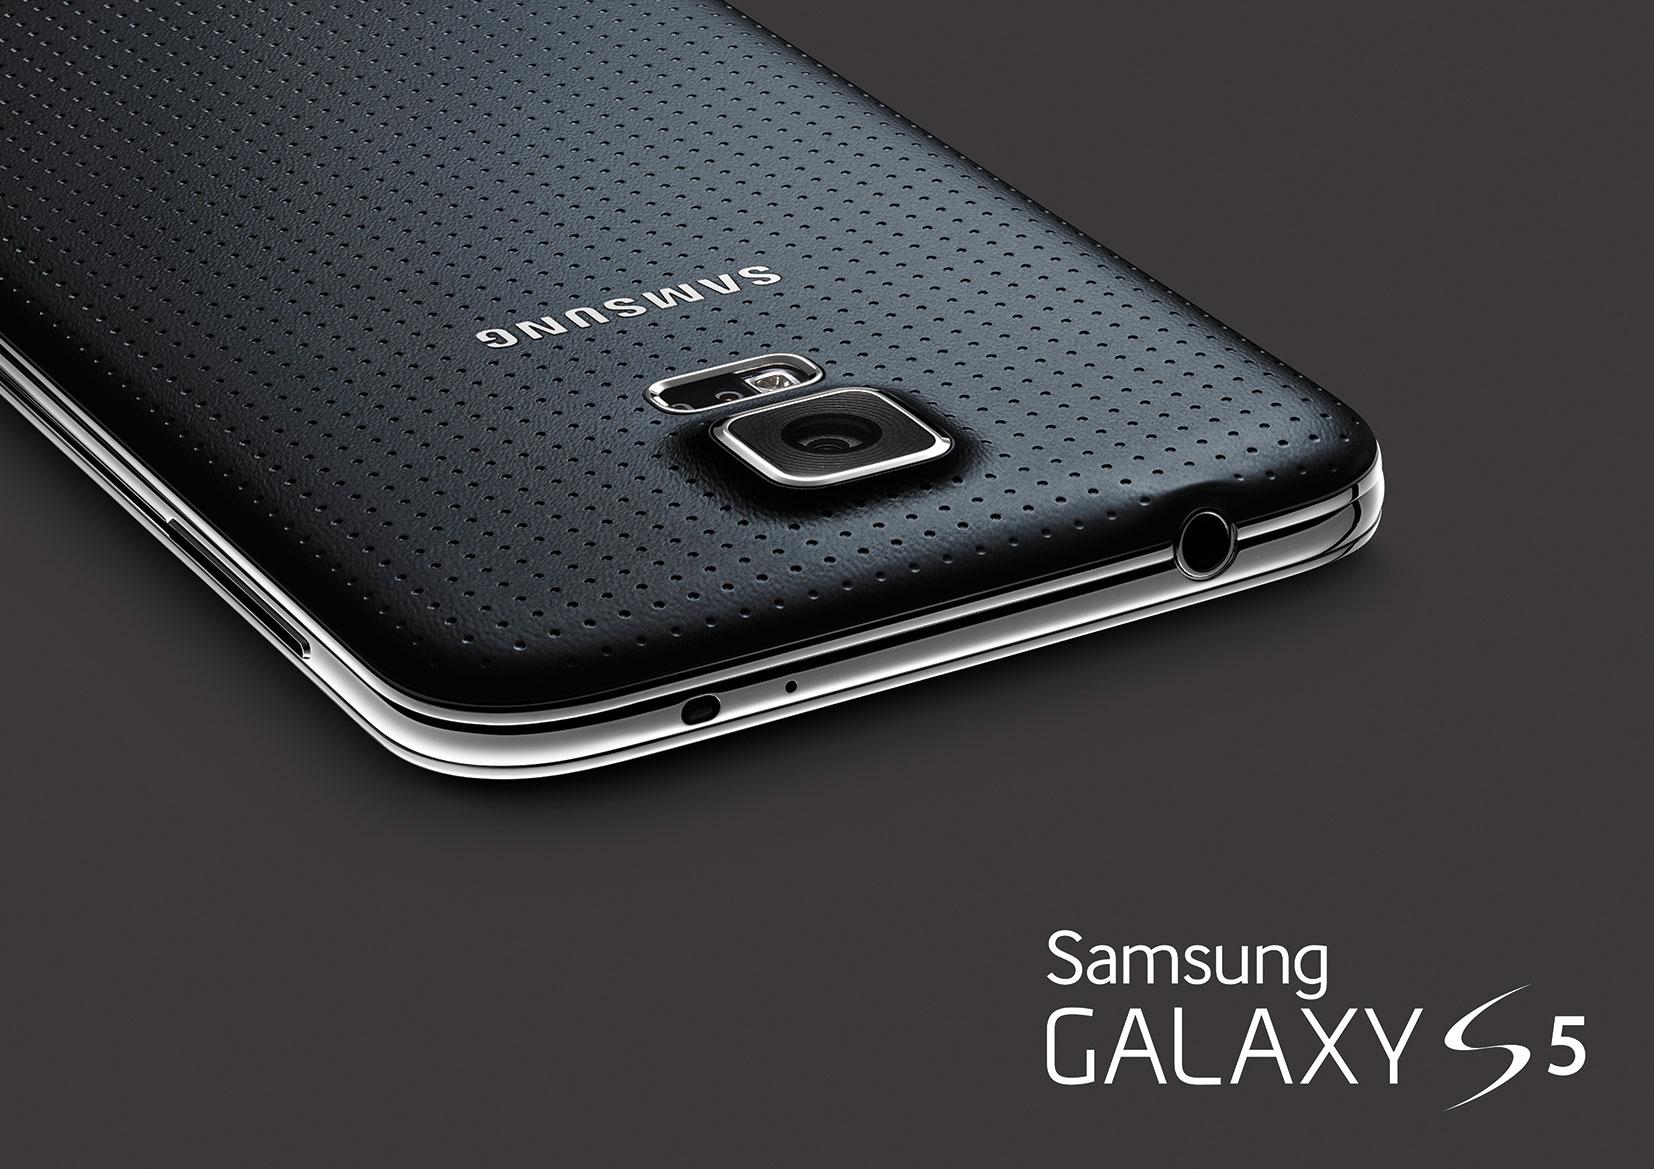 Samsung Galaxy S5 Prime: Präsentation im Juni [Gerücht]